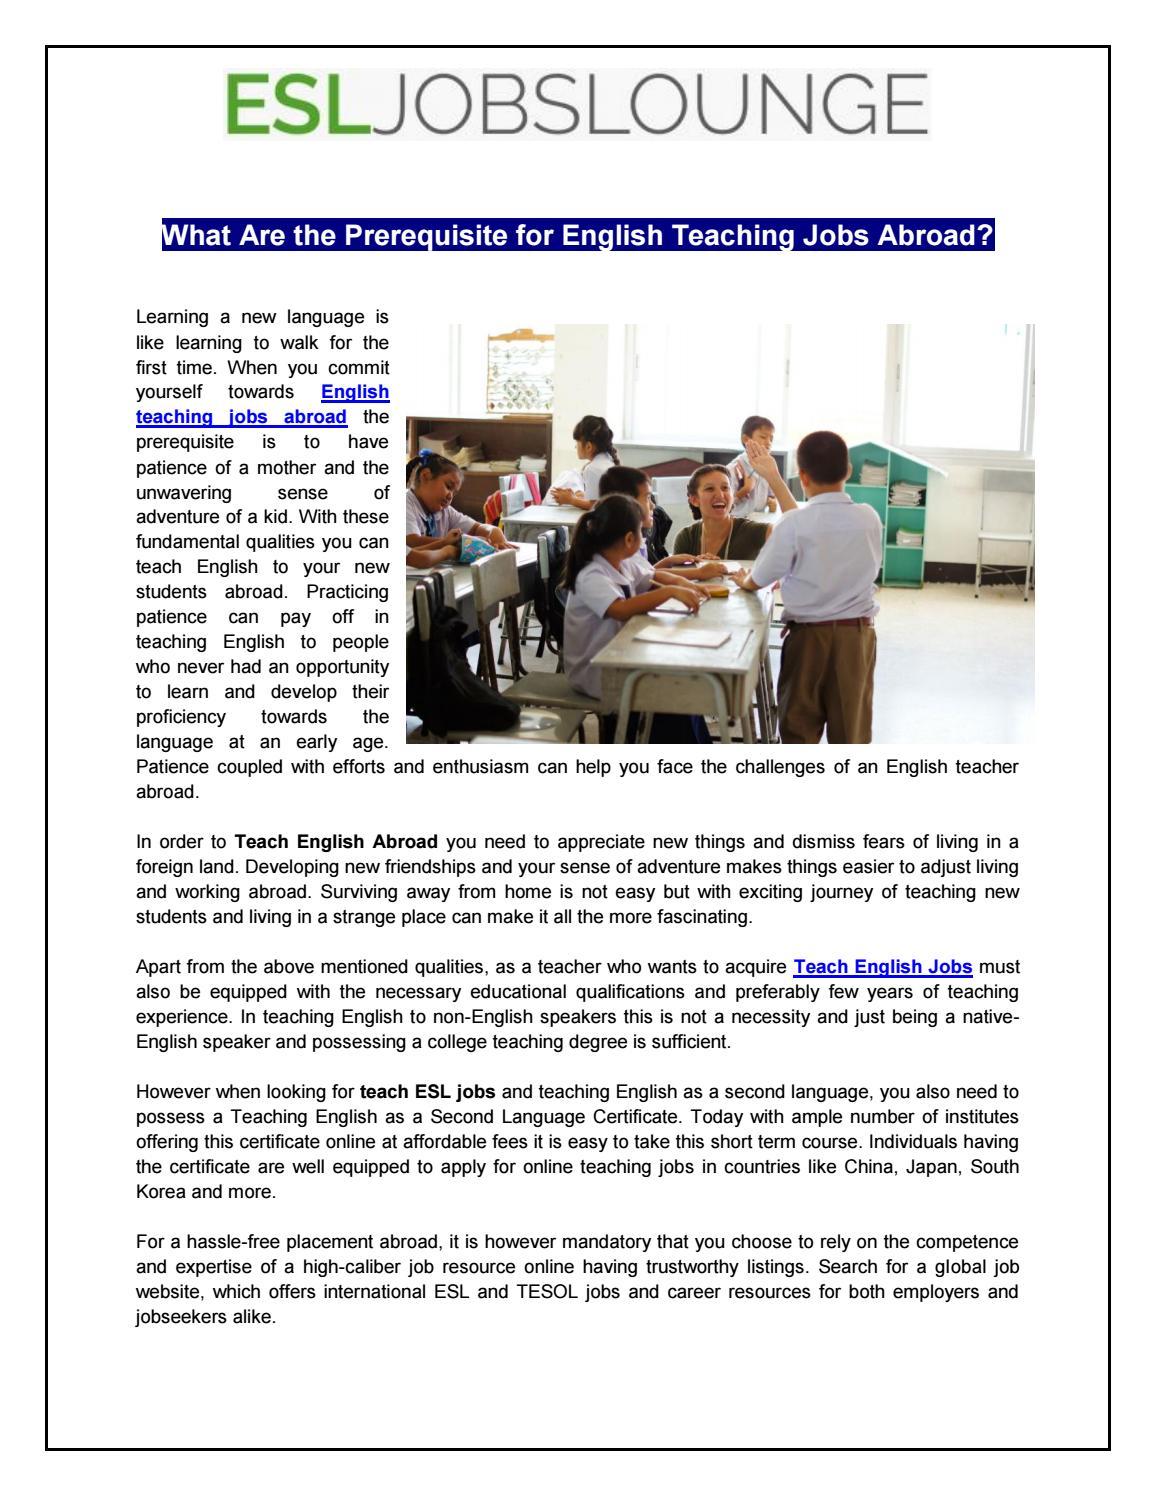 English teaching jobs abroad by Esljobs Lounge - issuu